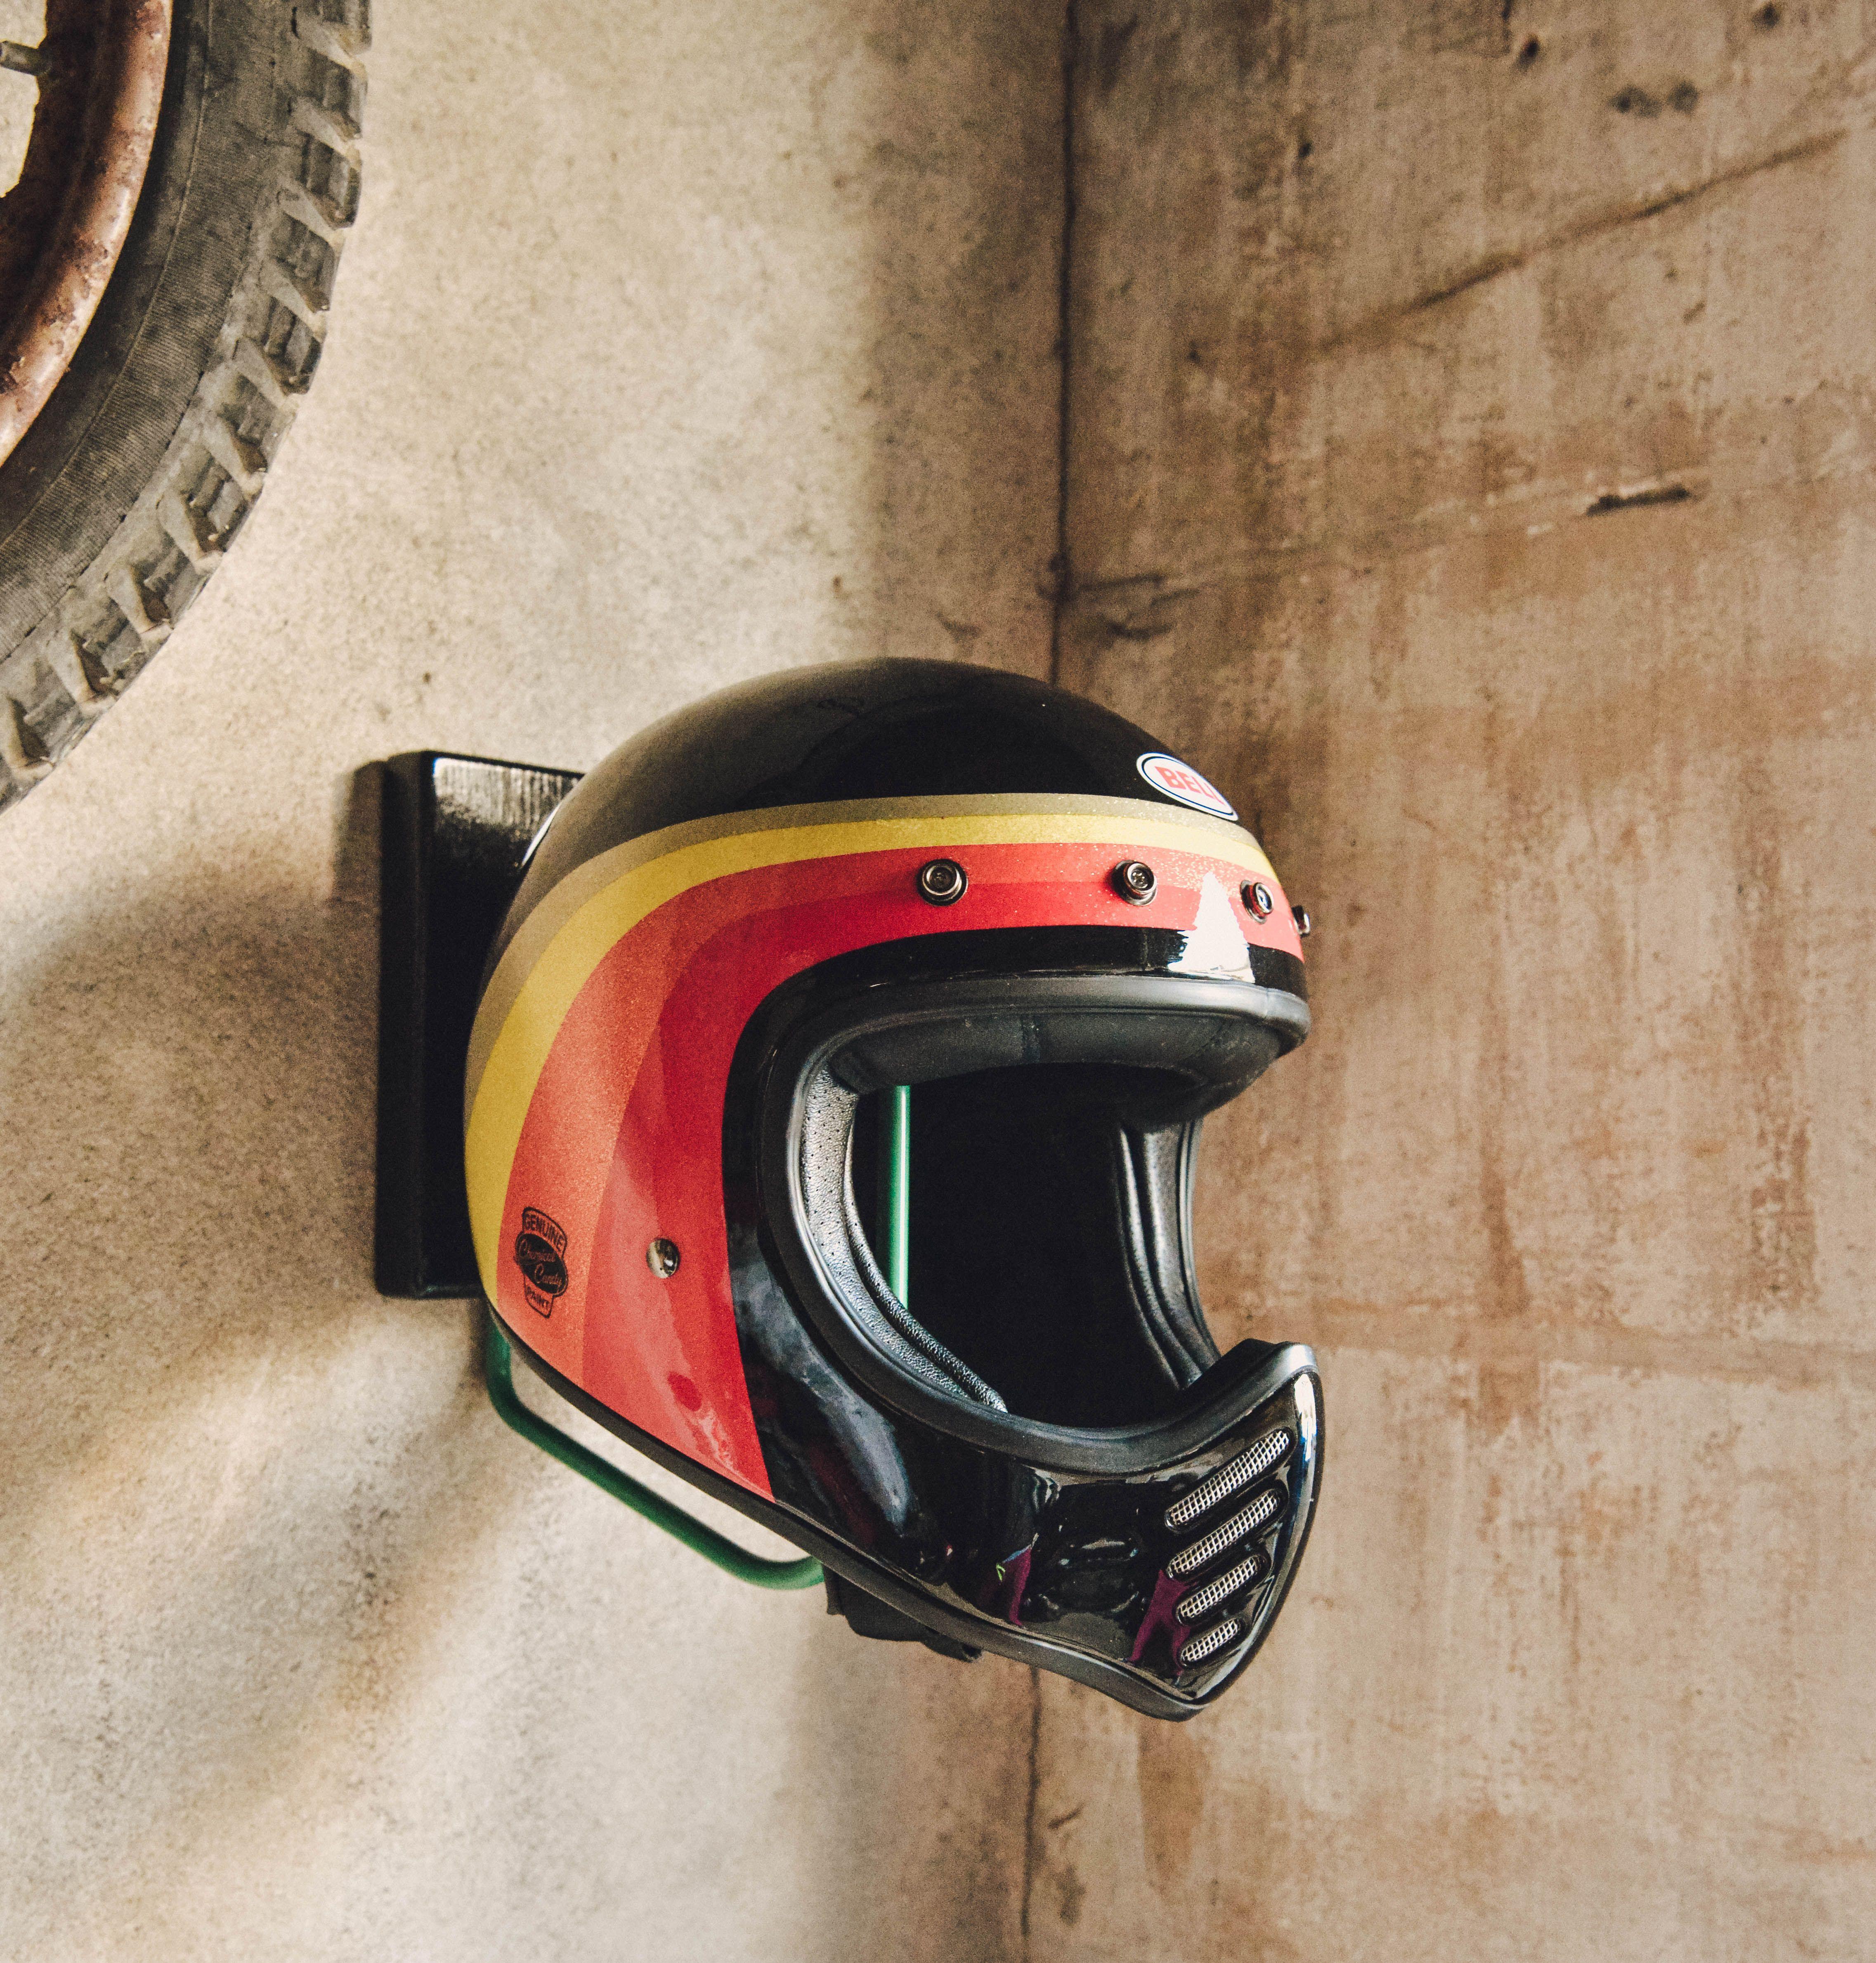 porte casque helmet rack france waynscot waynscot helmet rack helmet moto. Black Bedroom Furniture Sets. Home Design Ideas